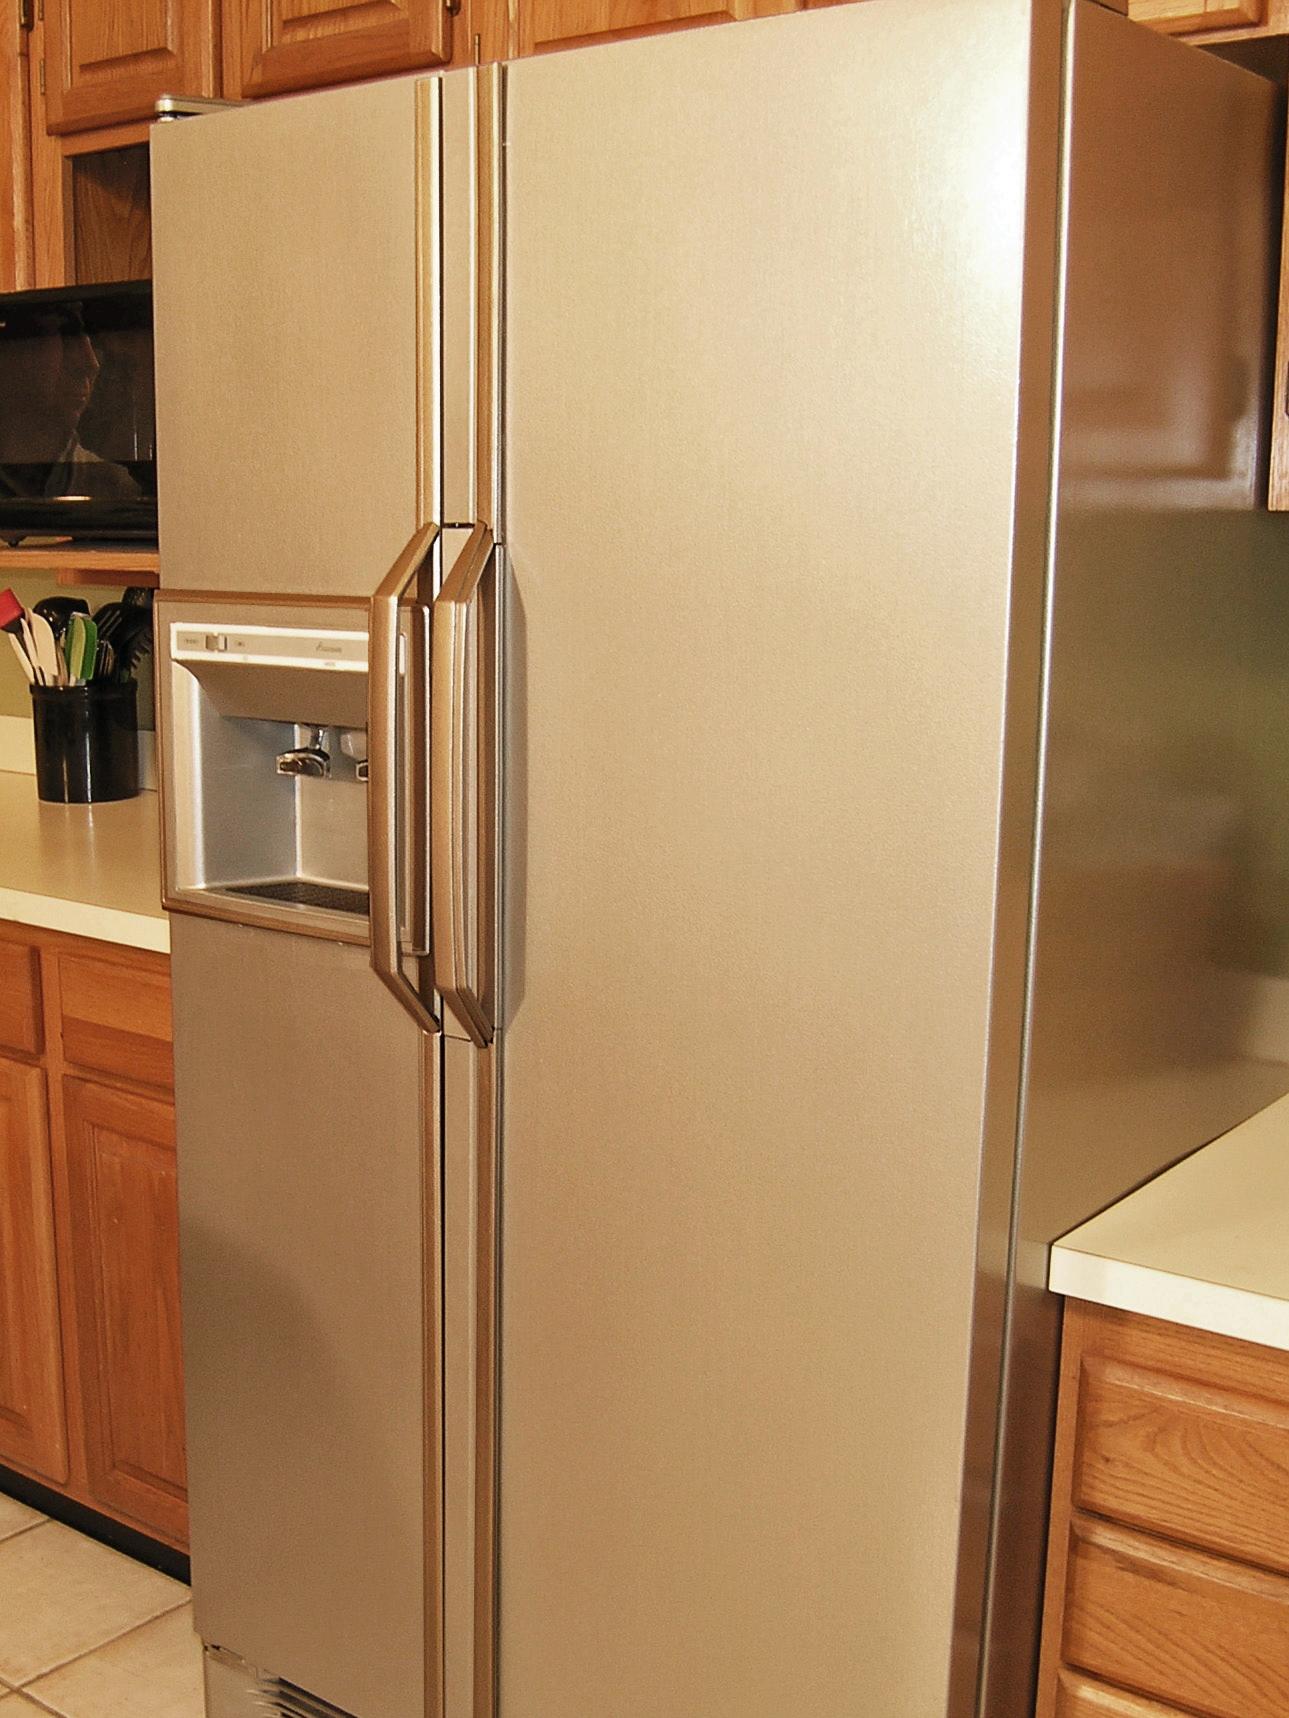 Transformation Nickle Stainless Steel Film REDO UPDATE Appliance Backsplash 12/'